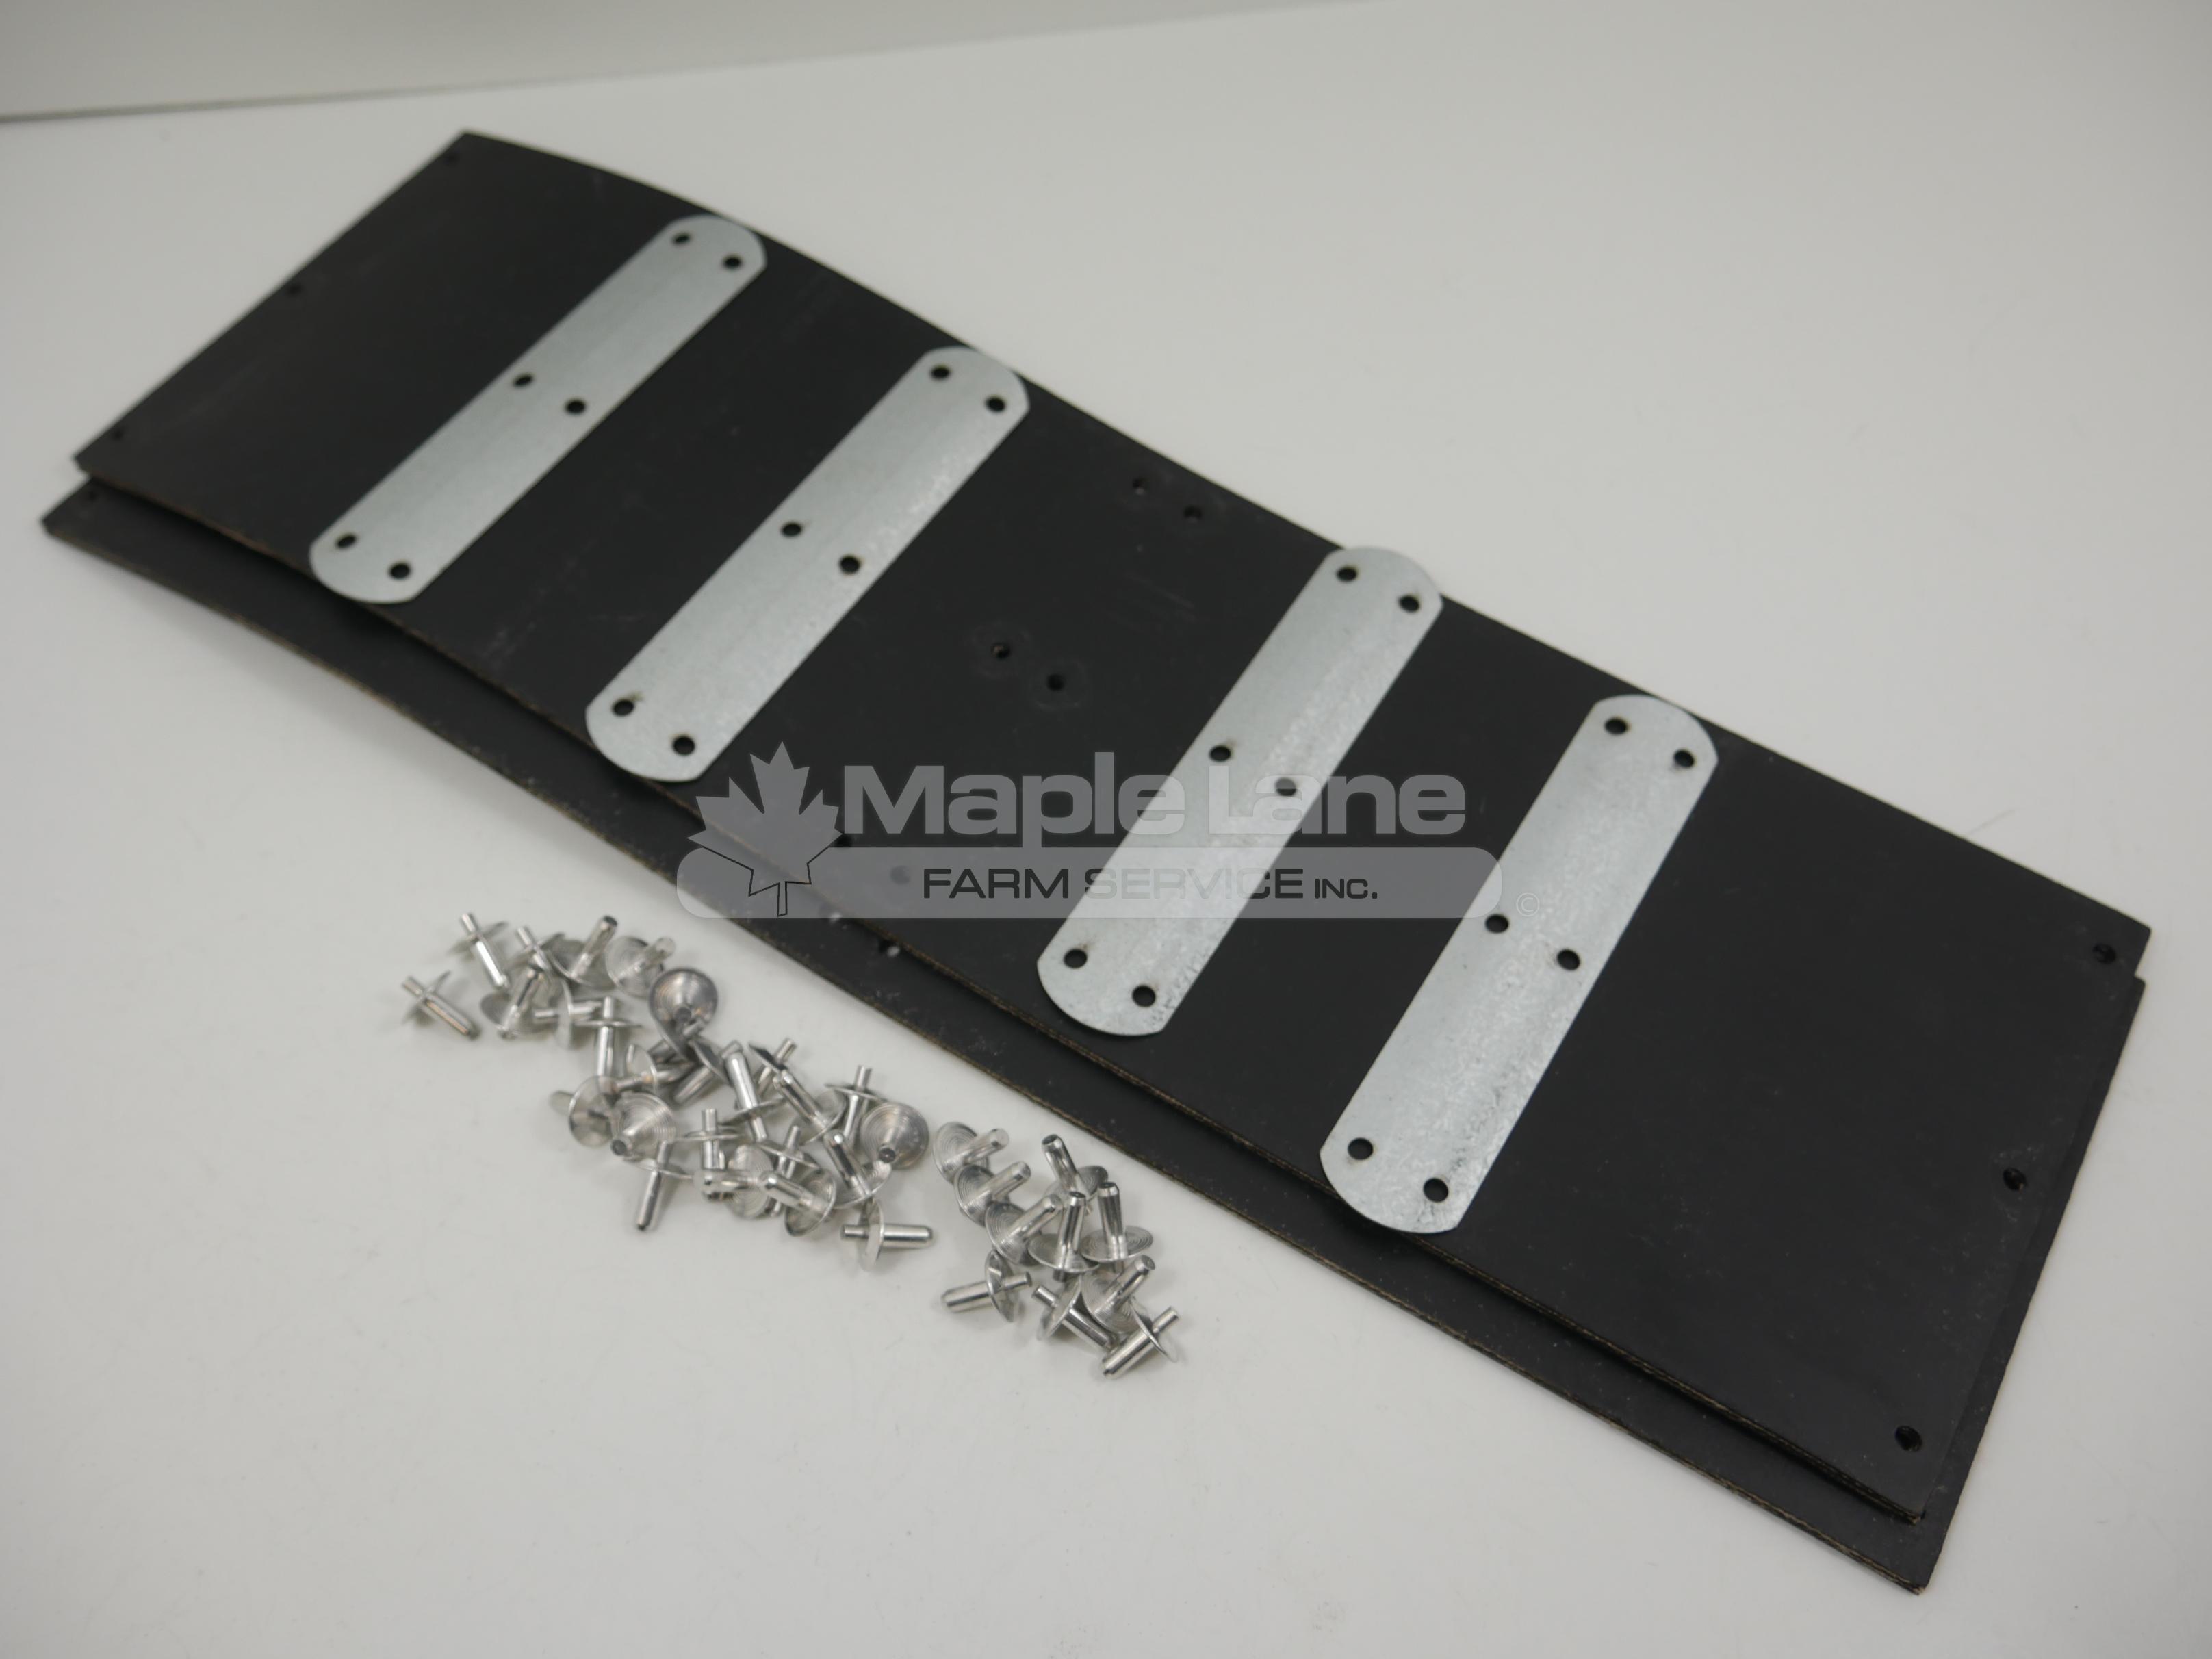 068633 Packing Roller Lagging Kit